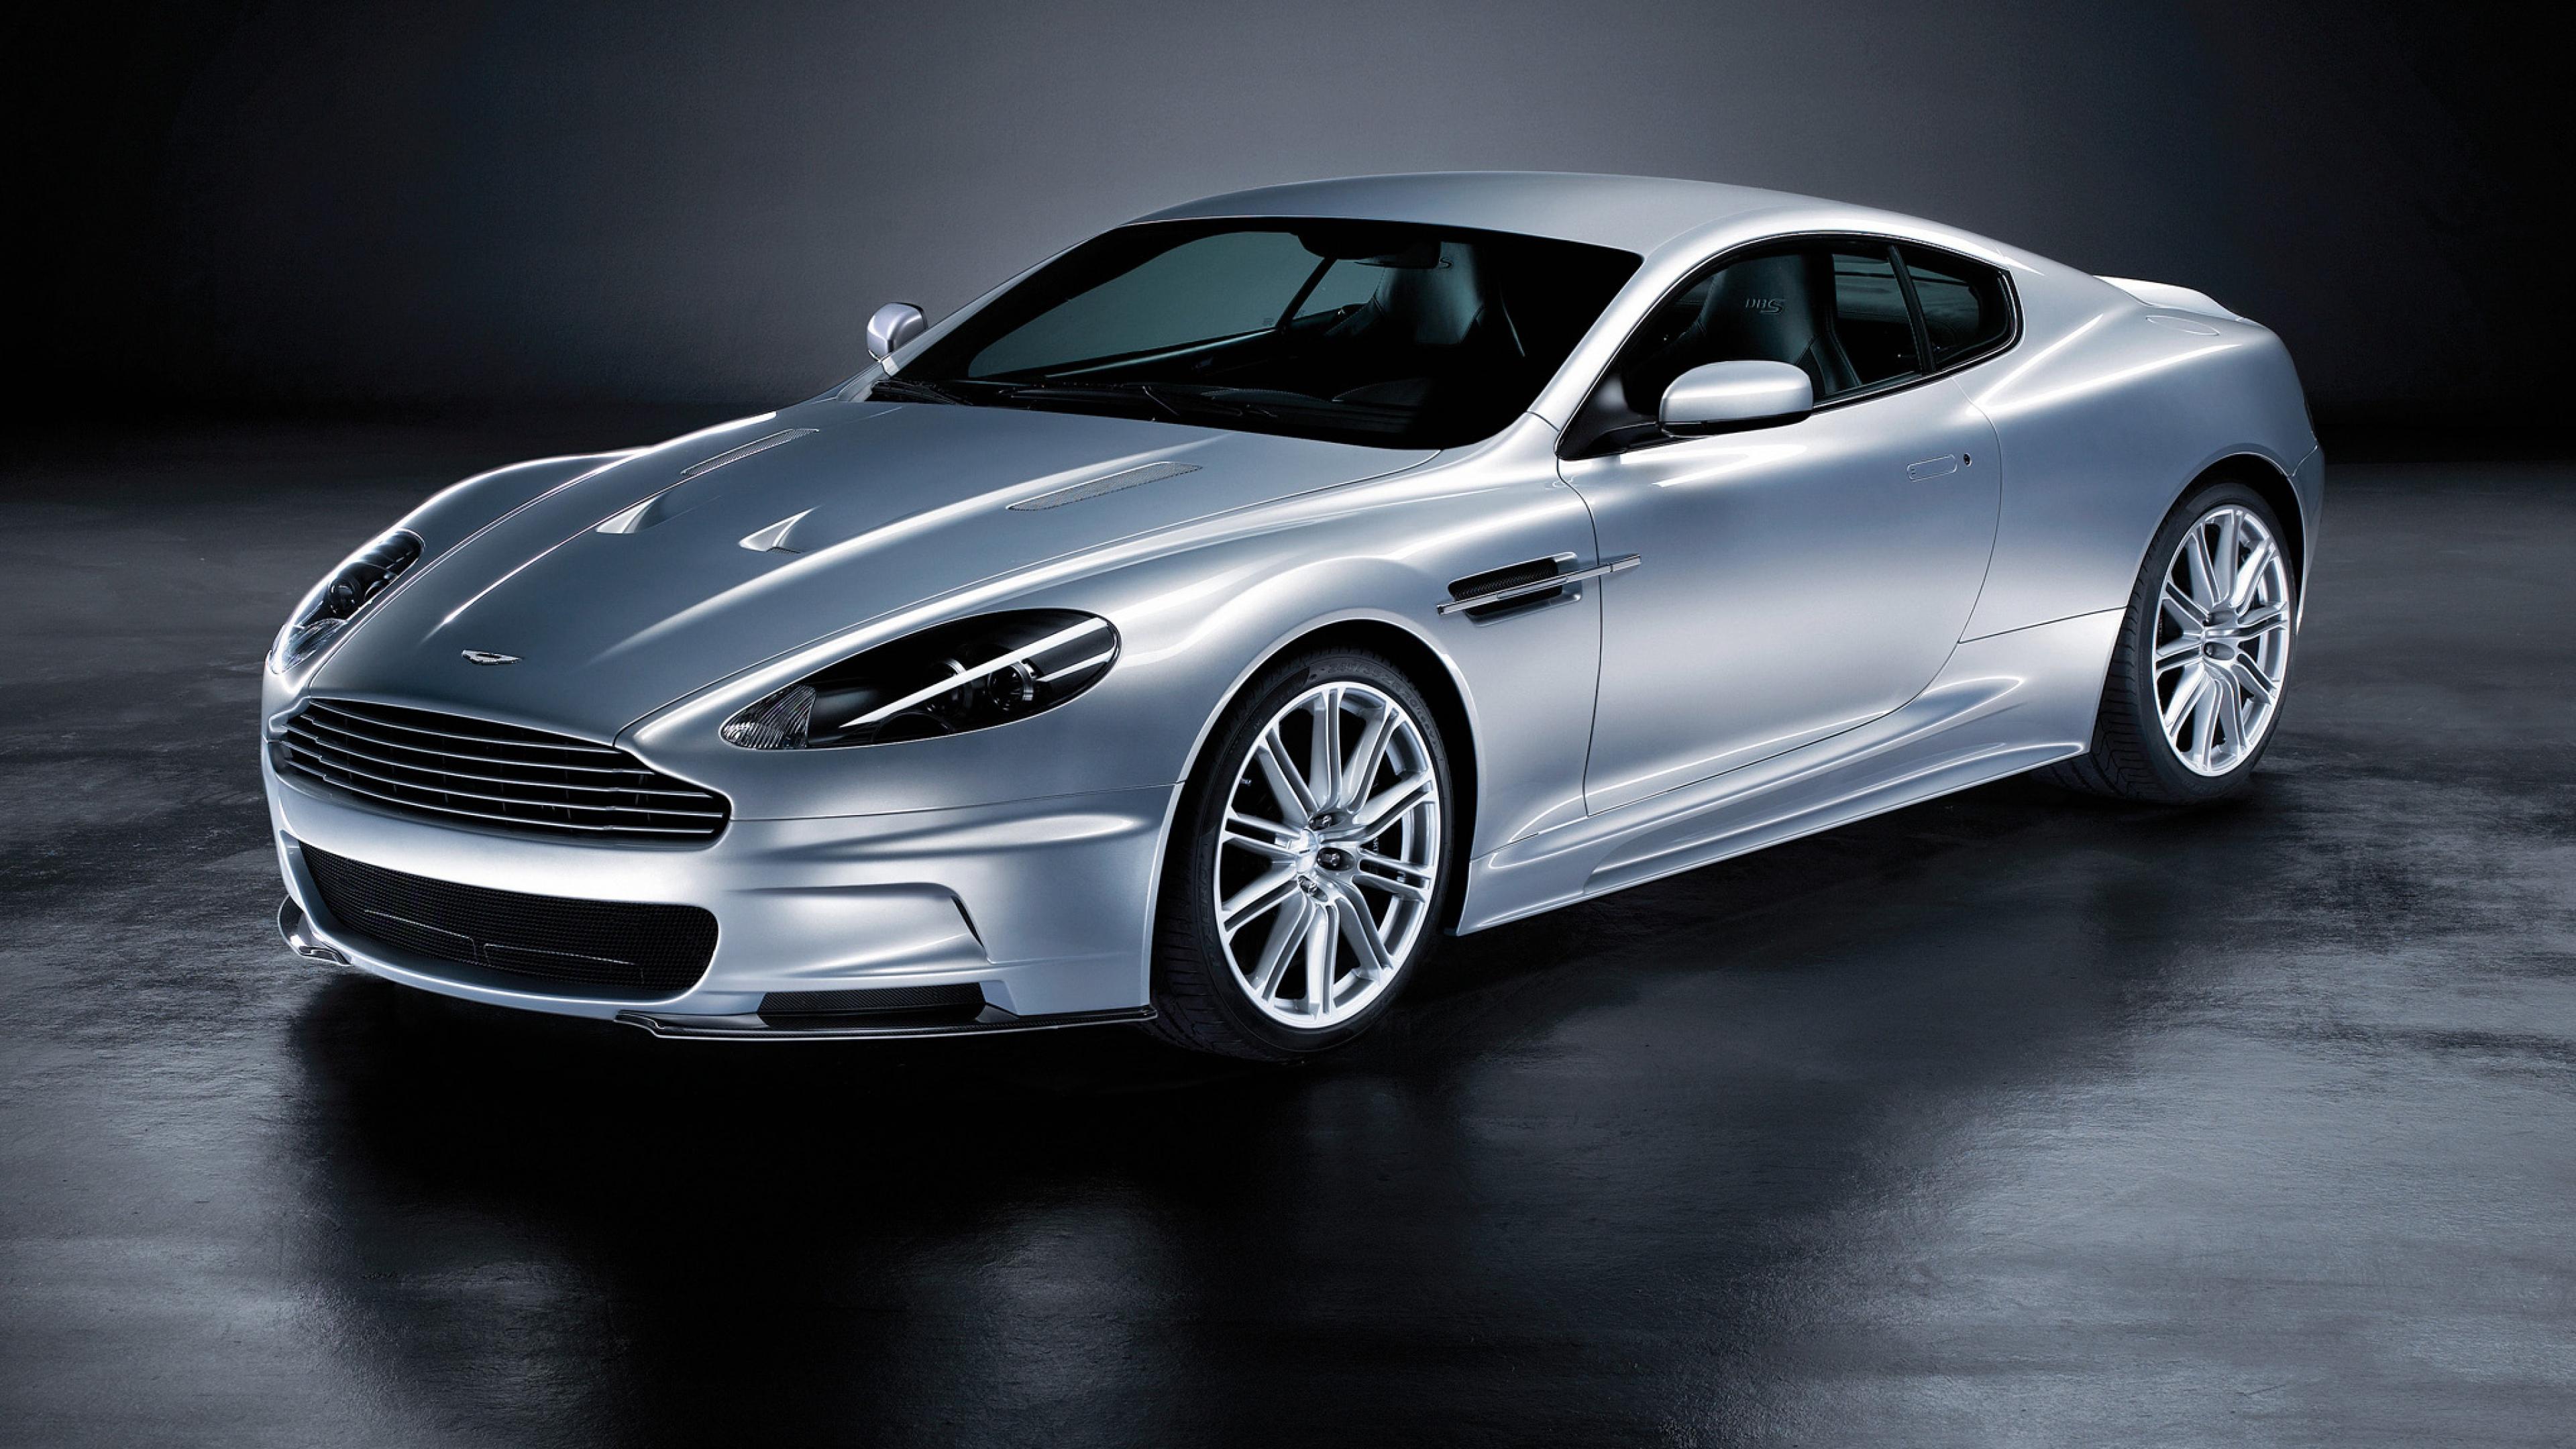 Download 3840x2160 Aston martin Dbs 2008 Silver metallic Side view 3840x2160